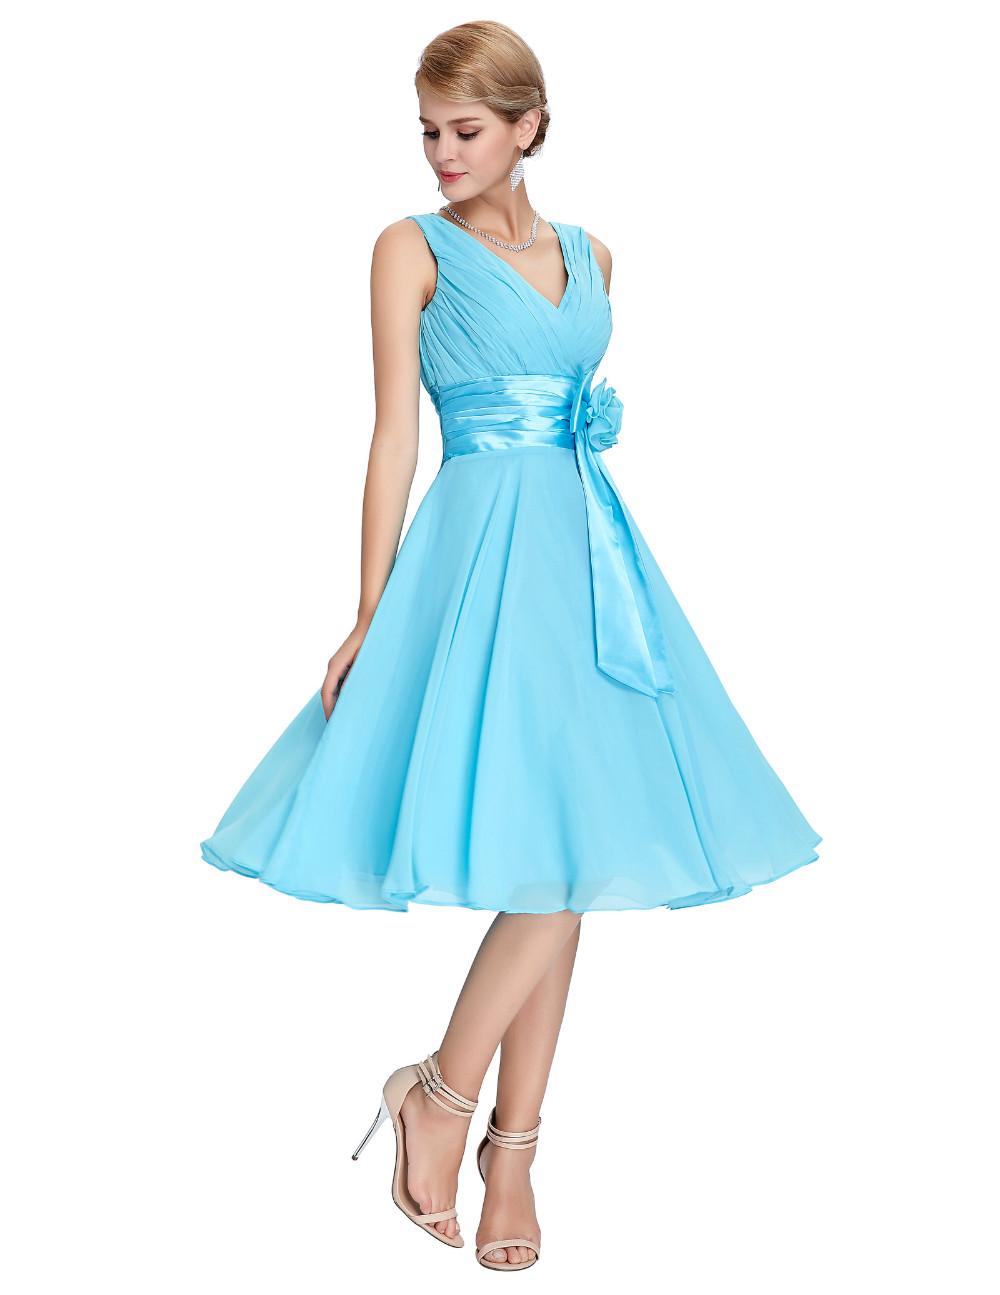 HTB1eOrLMVXXXXbXaXXXq6xXFXXXMKnee Length Short Chiffon Blue Dress